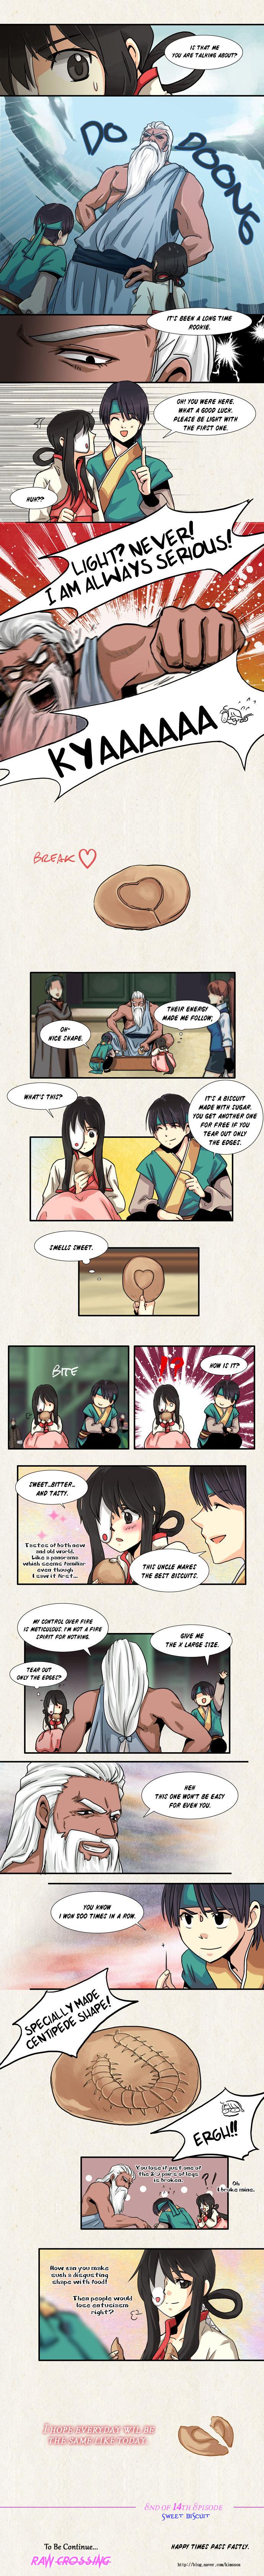 Gyon Woo Jik Nyu 14 Page 3